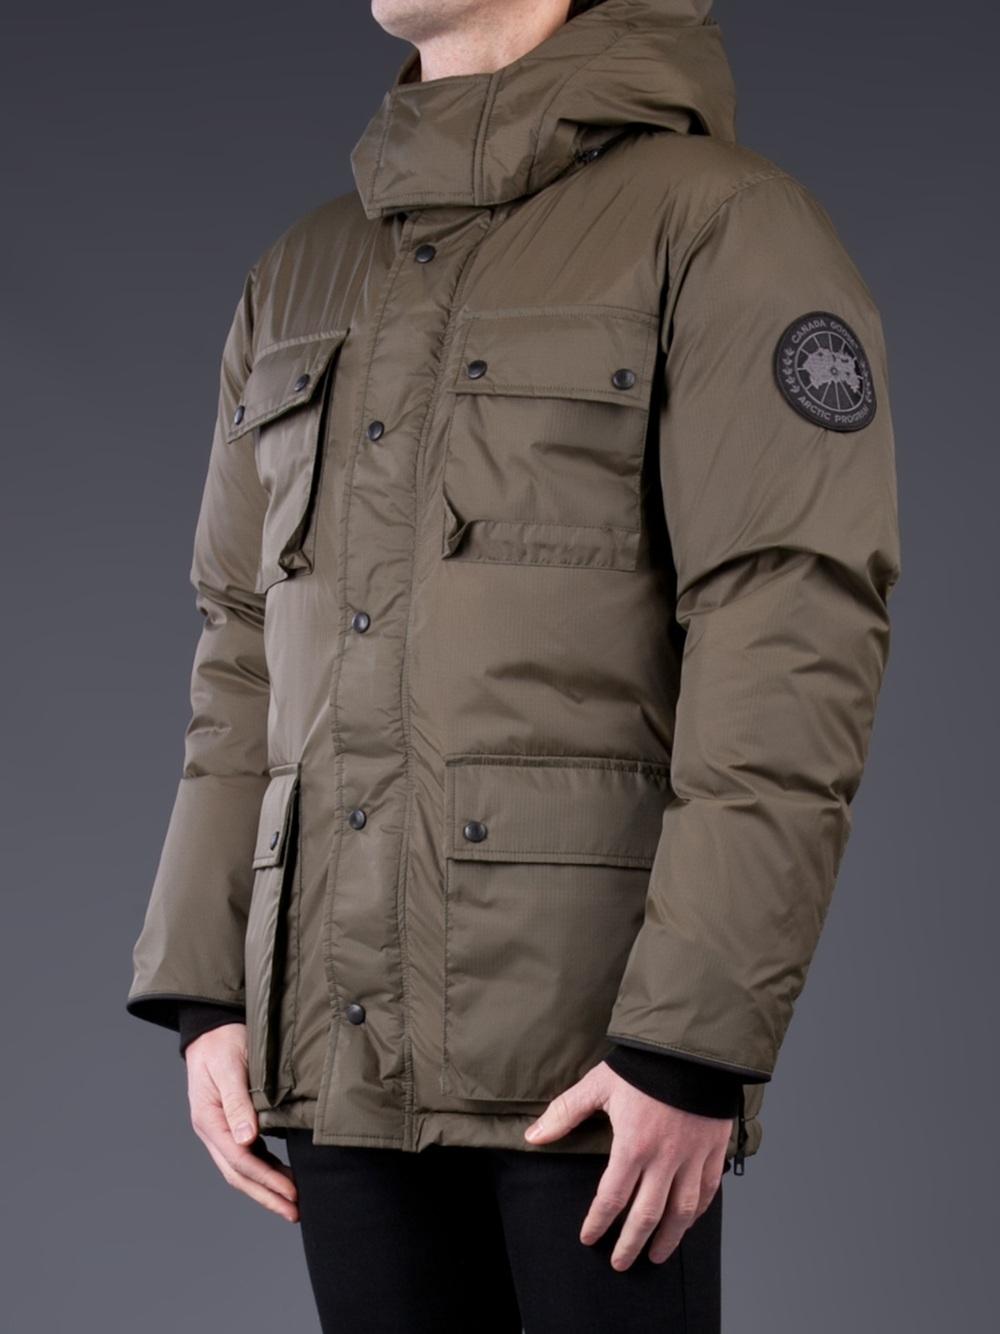 netherlands canada goose jackets on sale winnipeg quest 67ecf 6c1b7 rh frissedenkers com